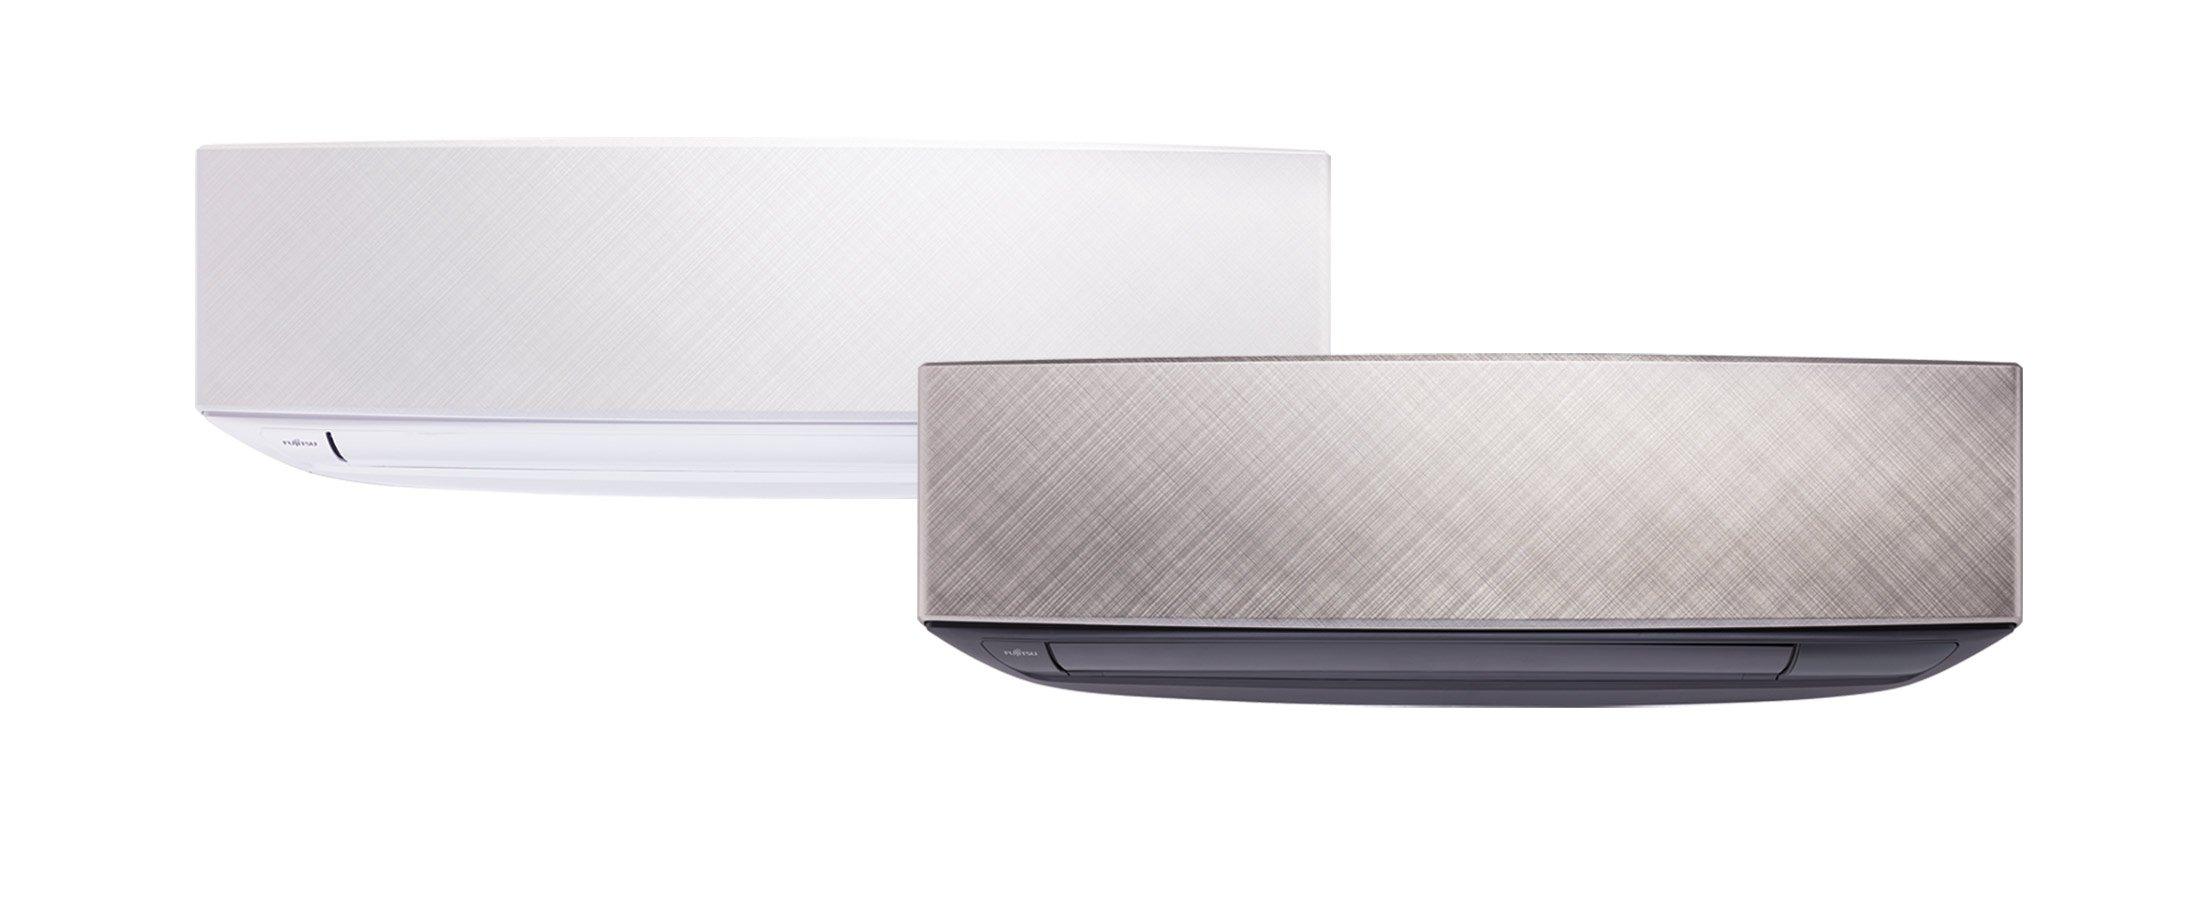 Fujitsu Designwandgeraet-KETA_silber_weiß